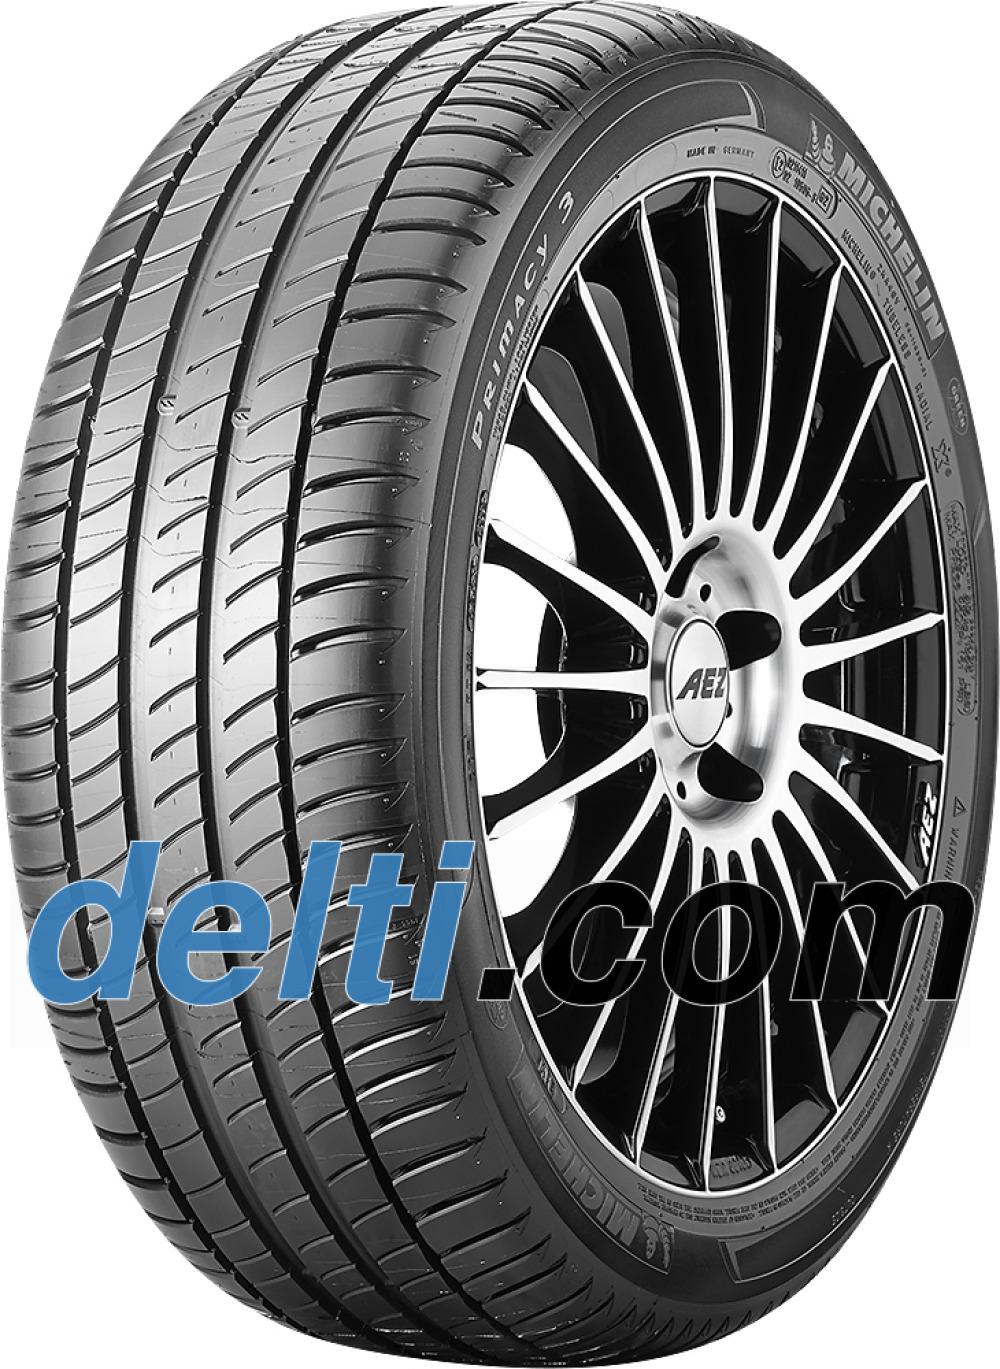 Michelin Primacy 3 ZP ( 205/55 R16 91V runflat, mit Felgenschutzleiste (FSL) )